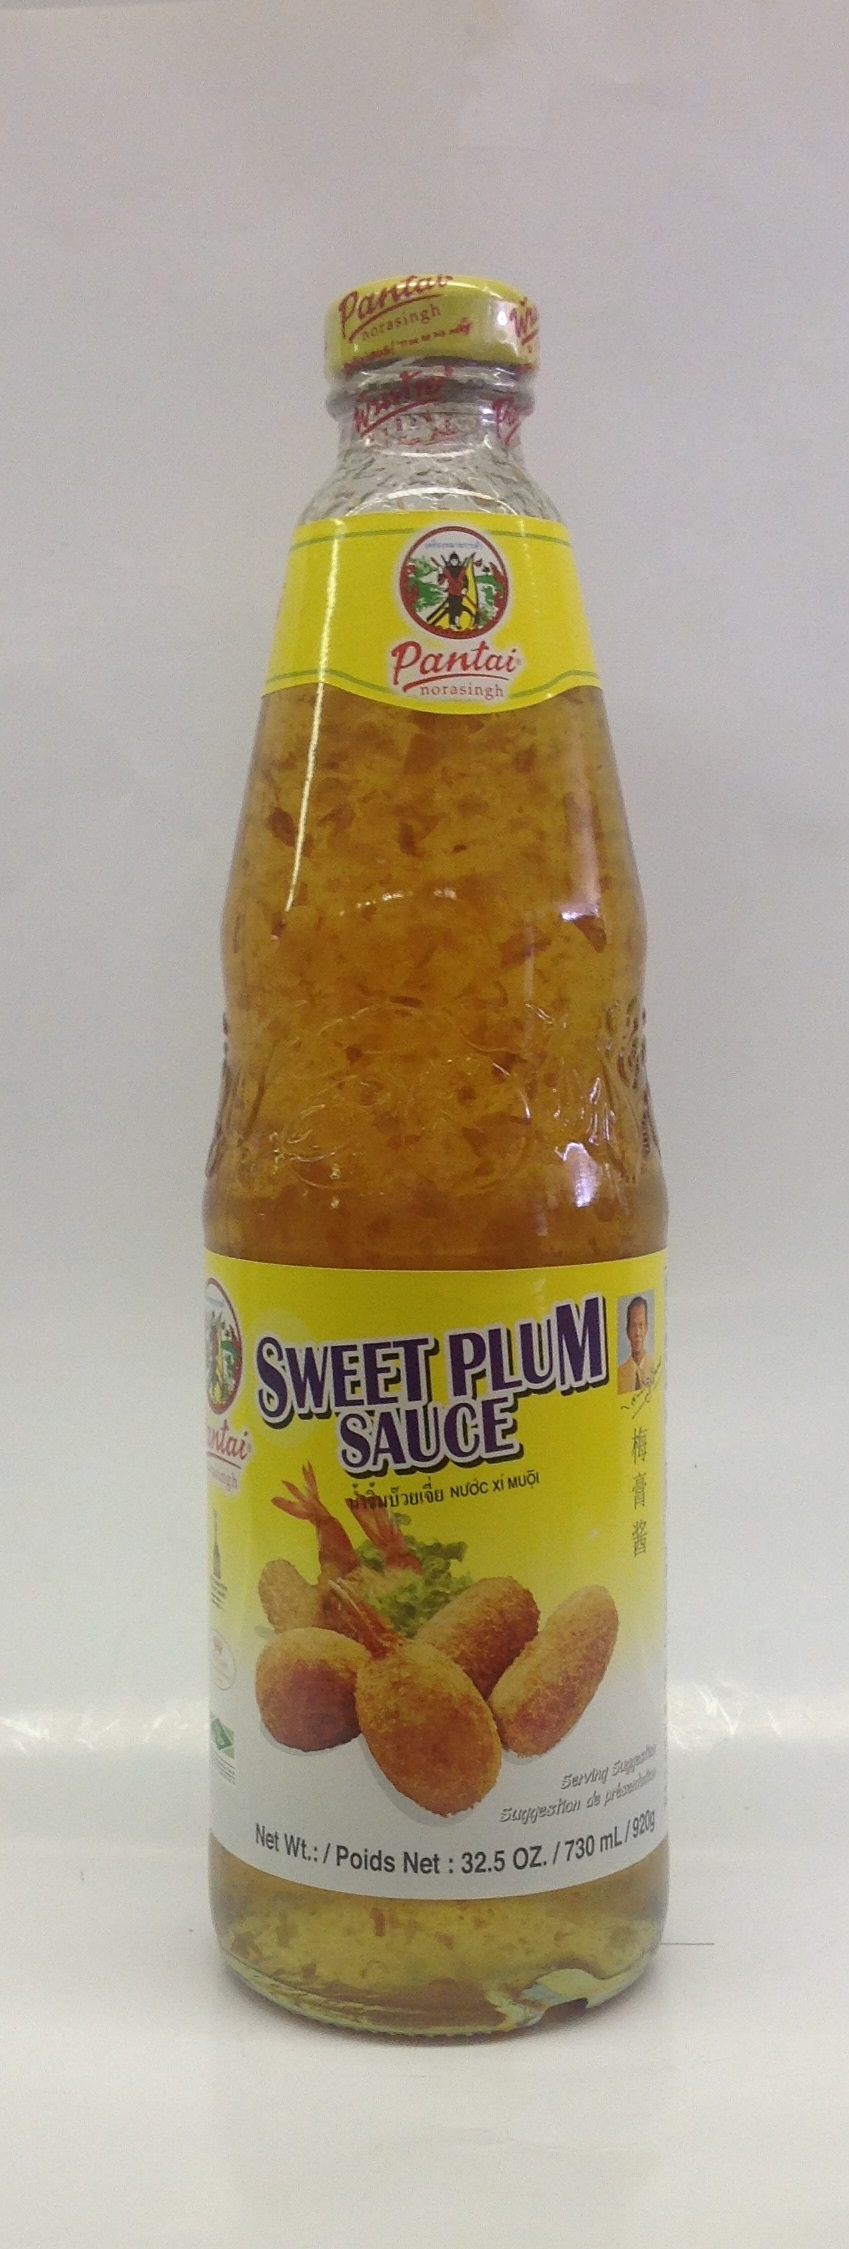 Sweet Plum Sauce   Pantai   SA17061 12x32 oz